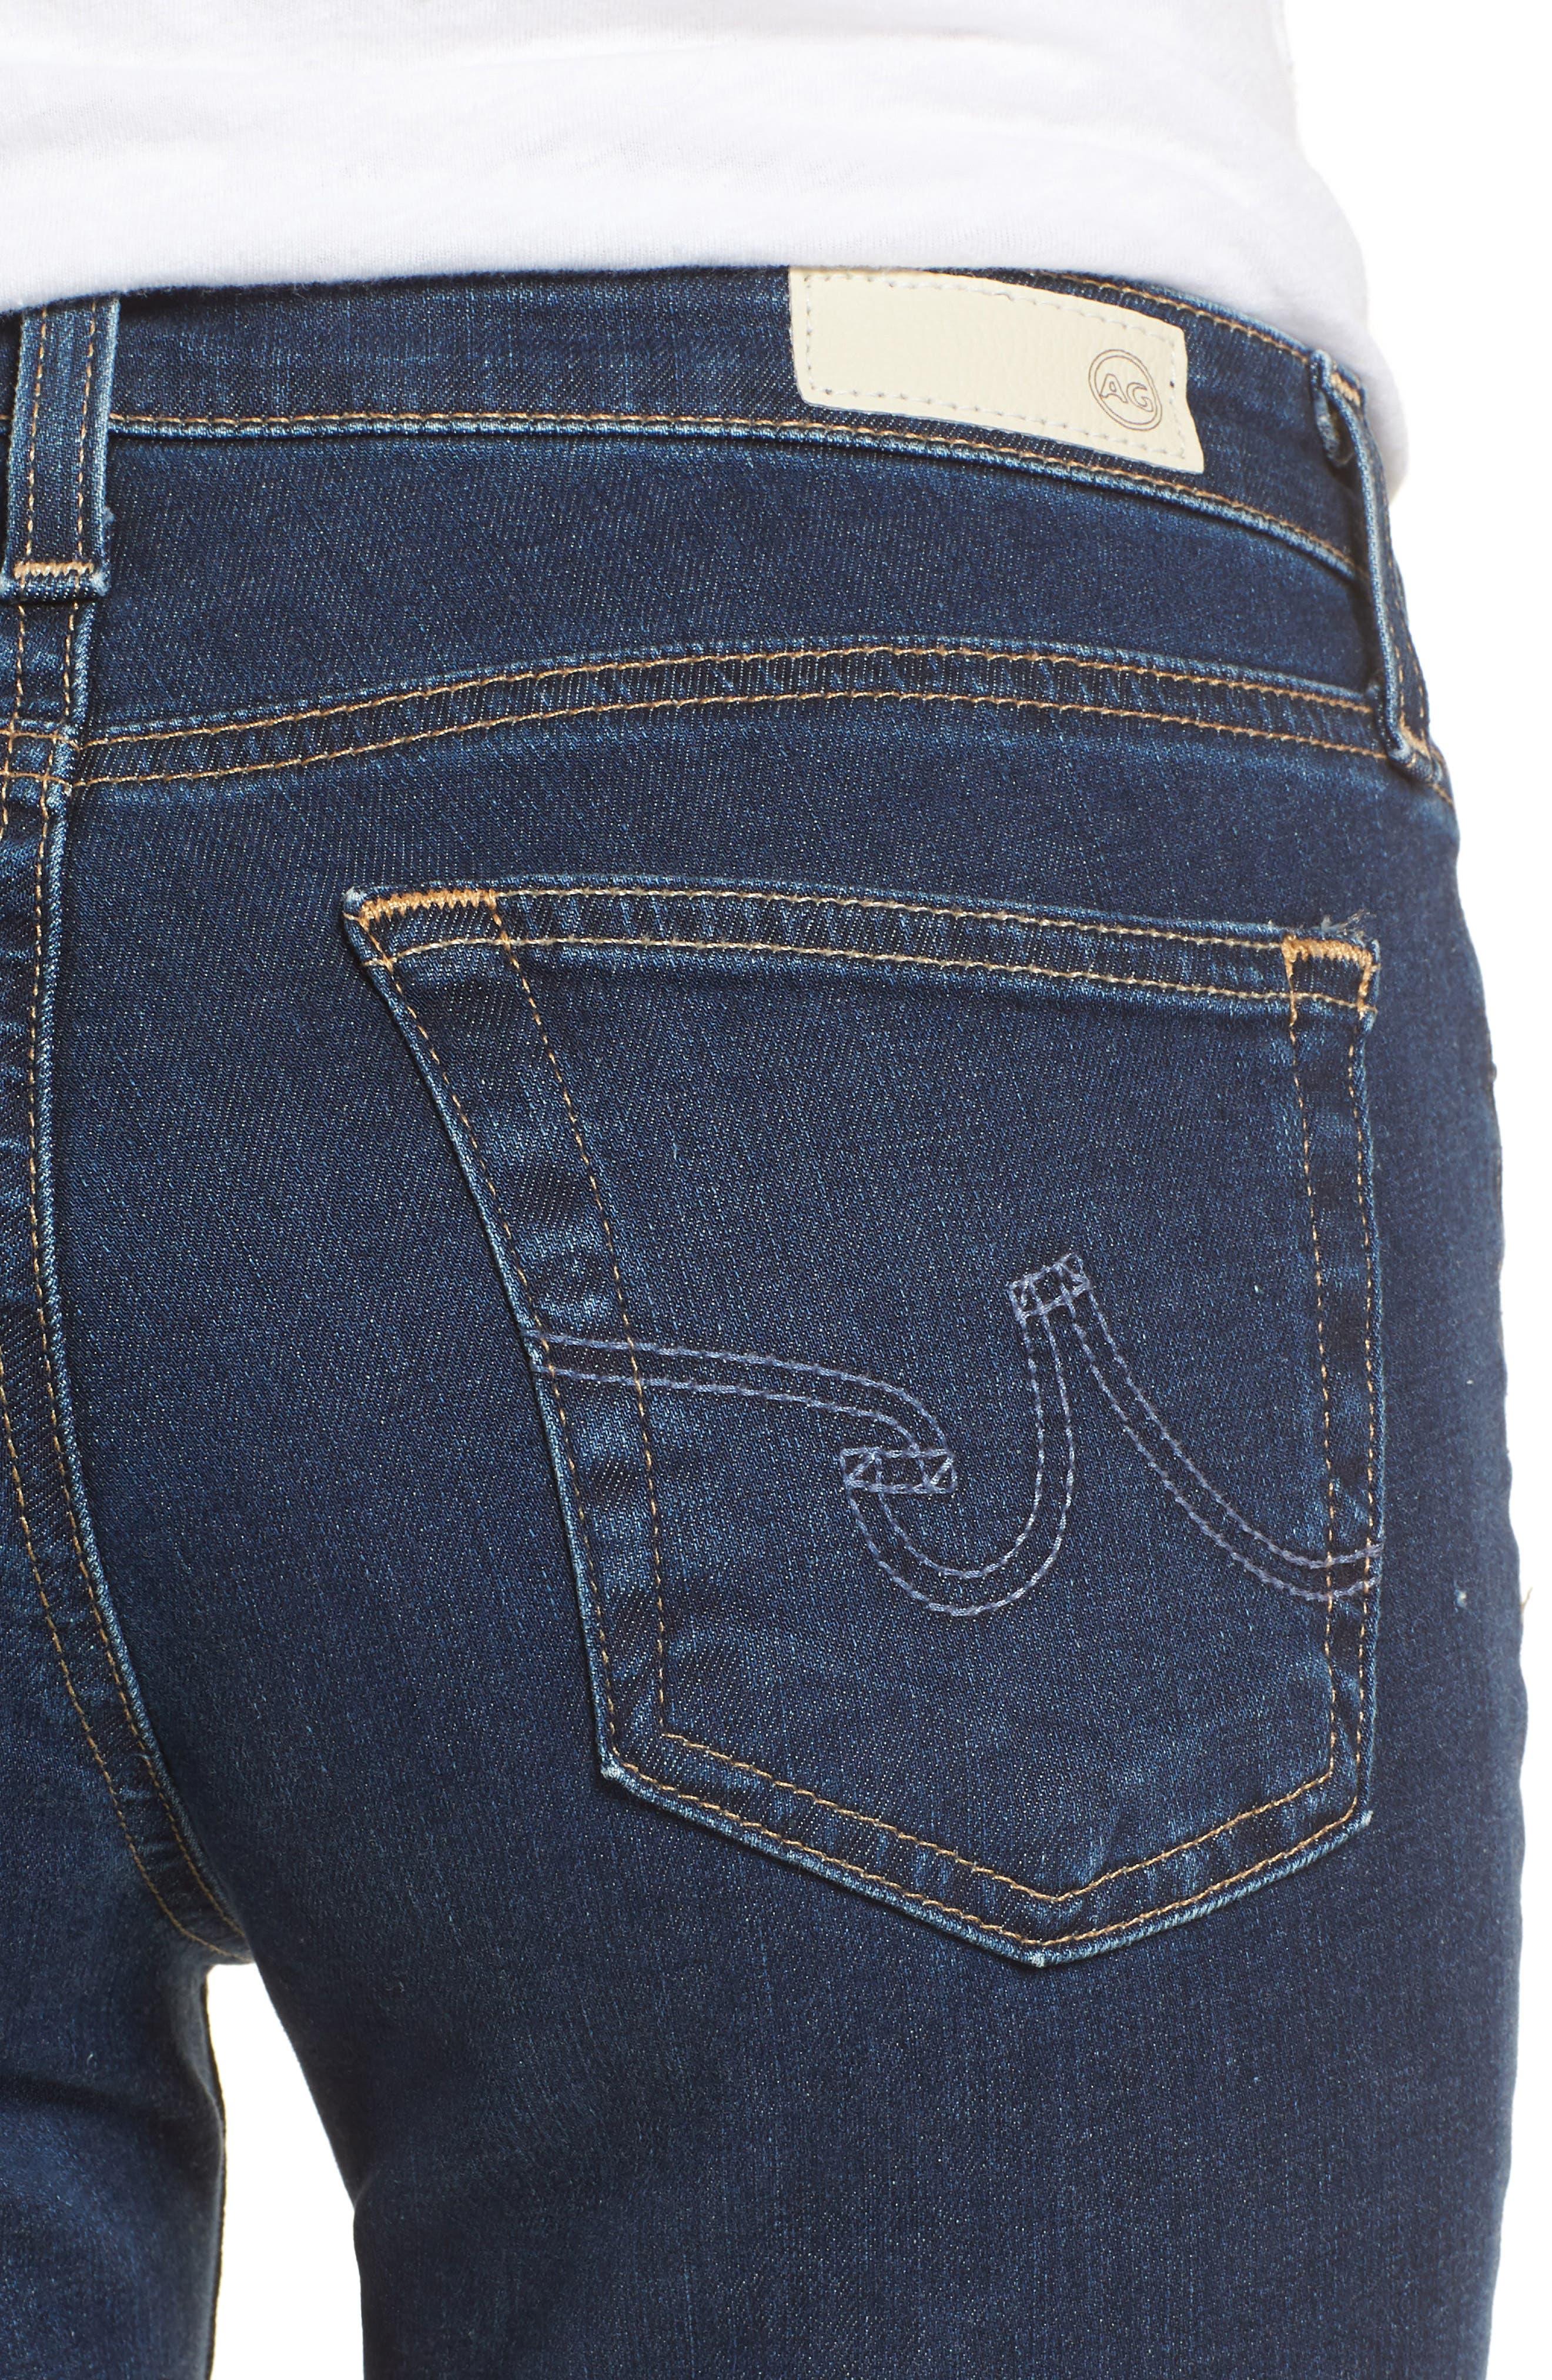 'The Legging' Super Skinny Jeans,                             Alternate thumbnail 39, color,